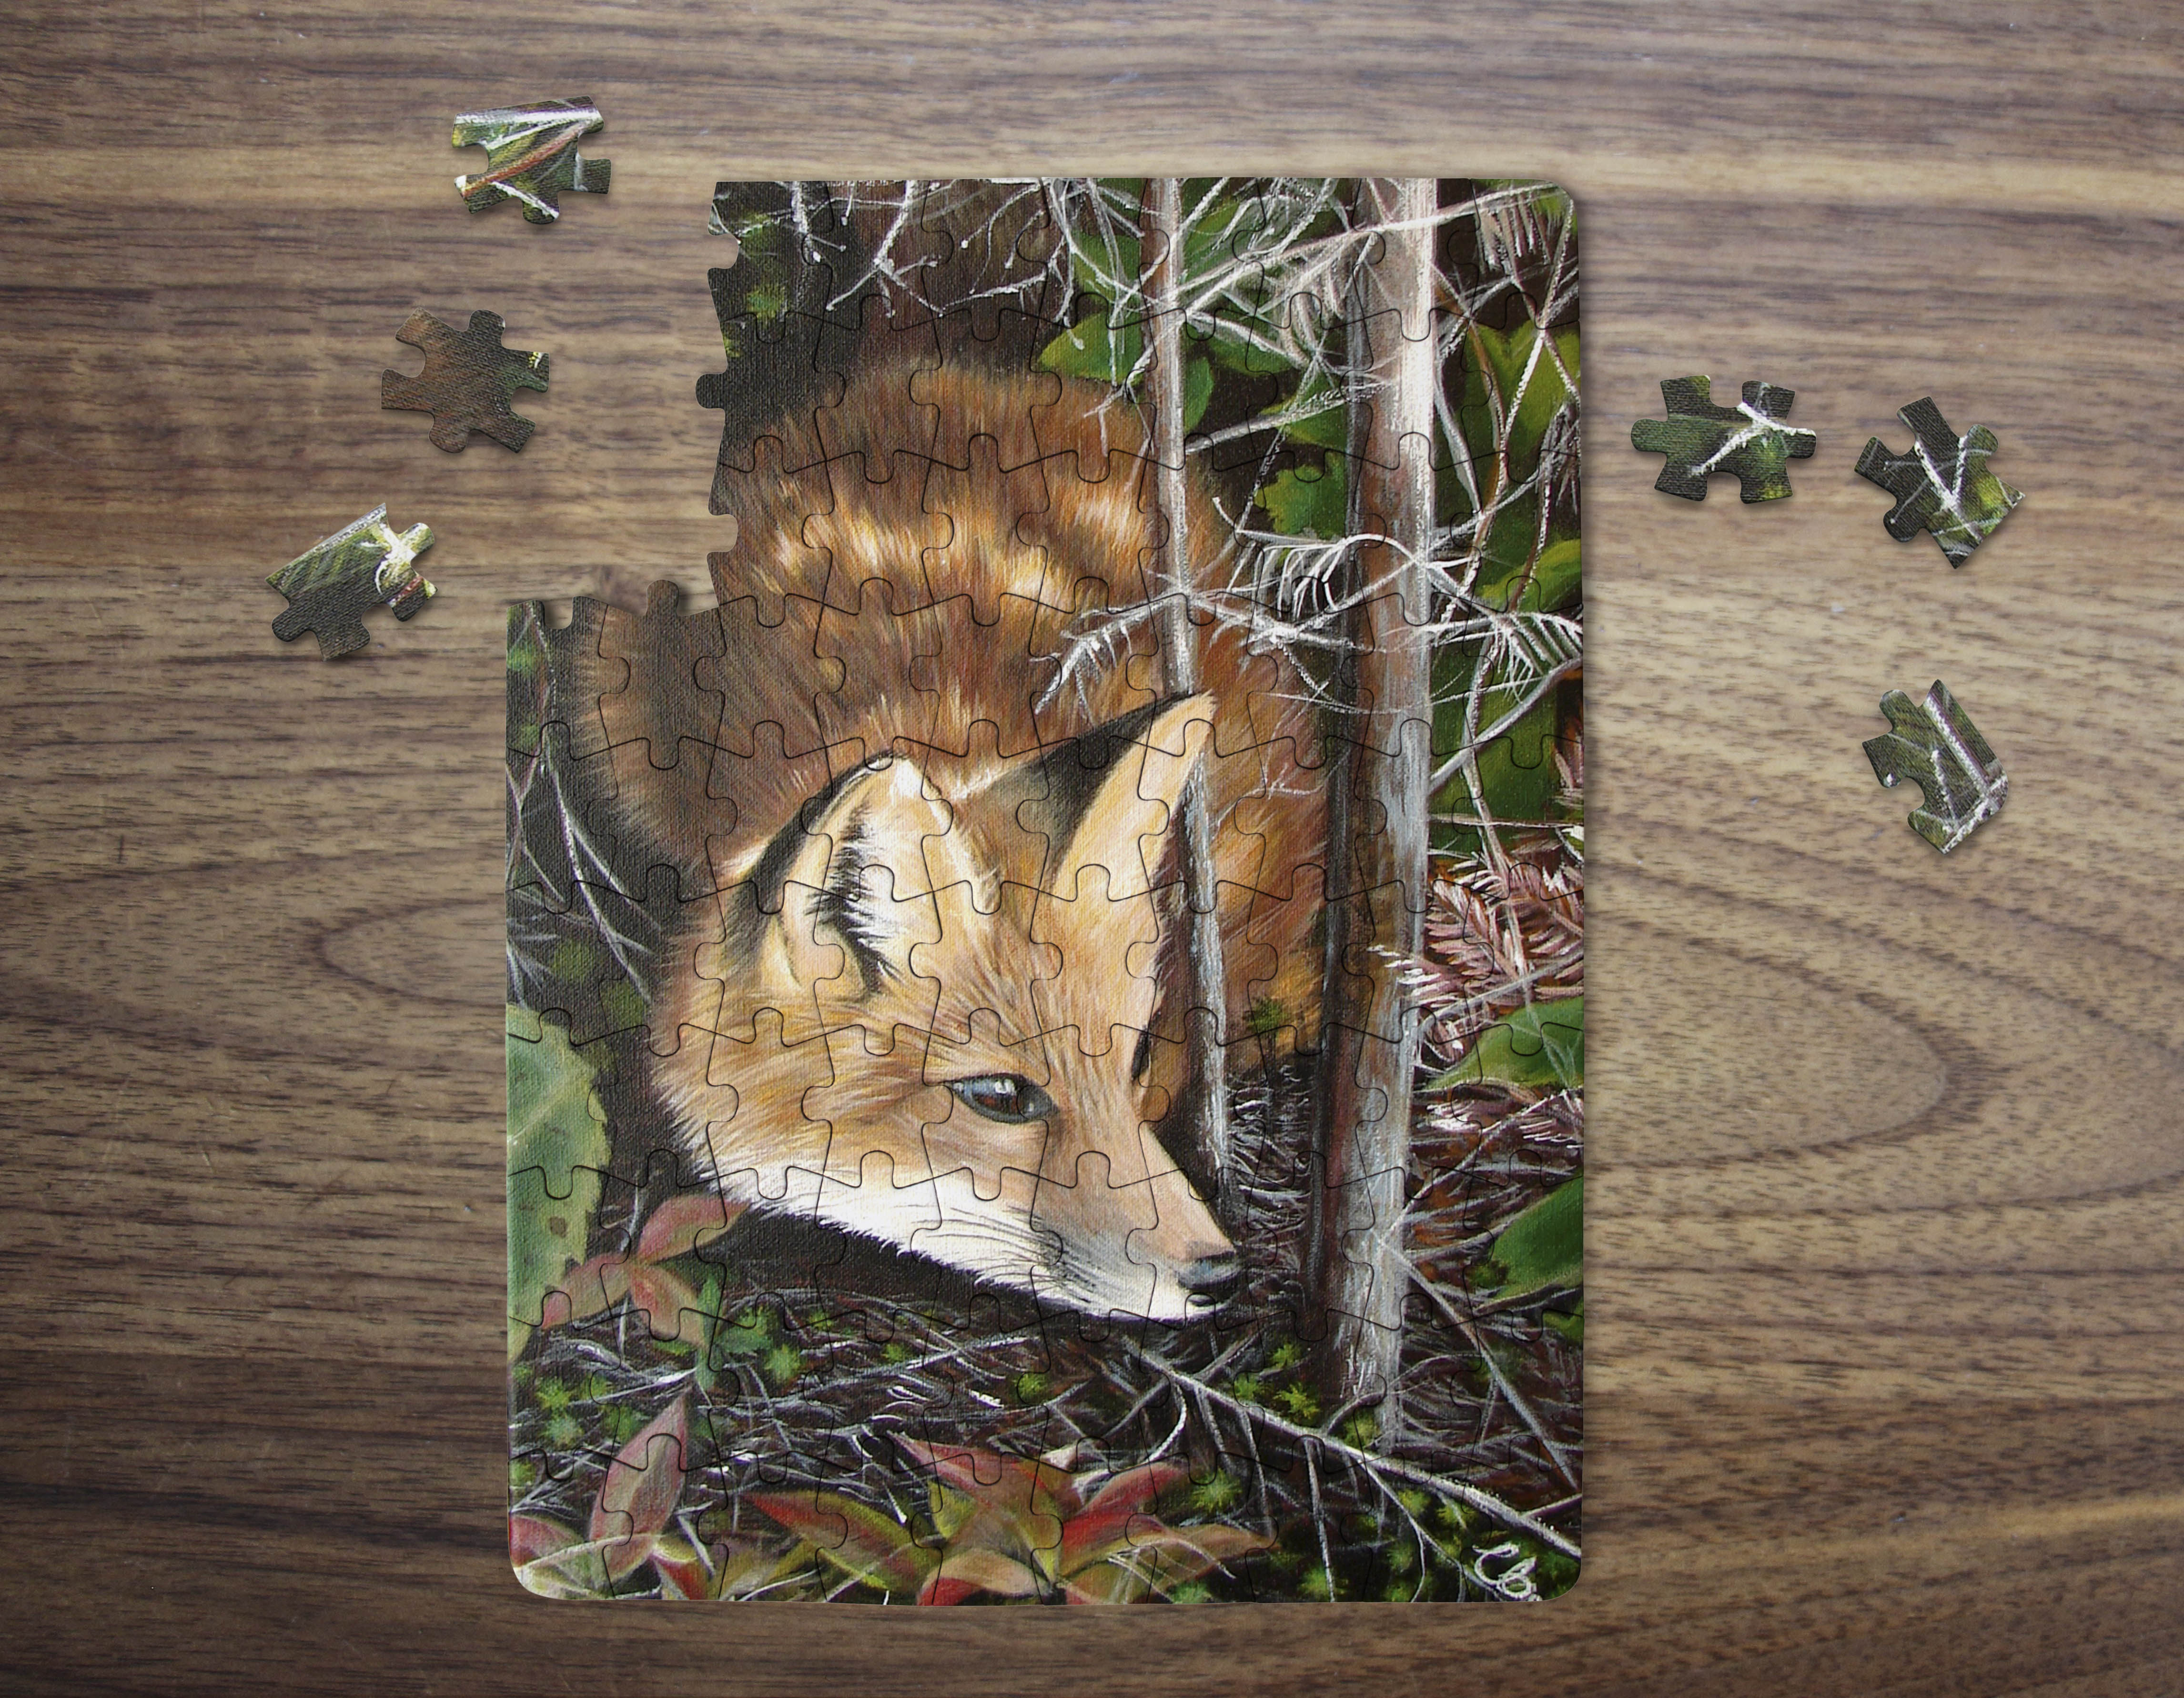 renard puzzple